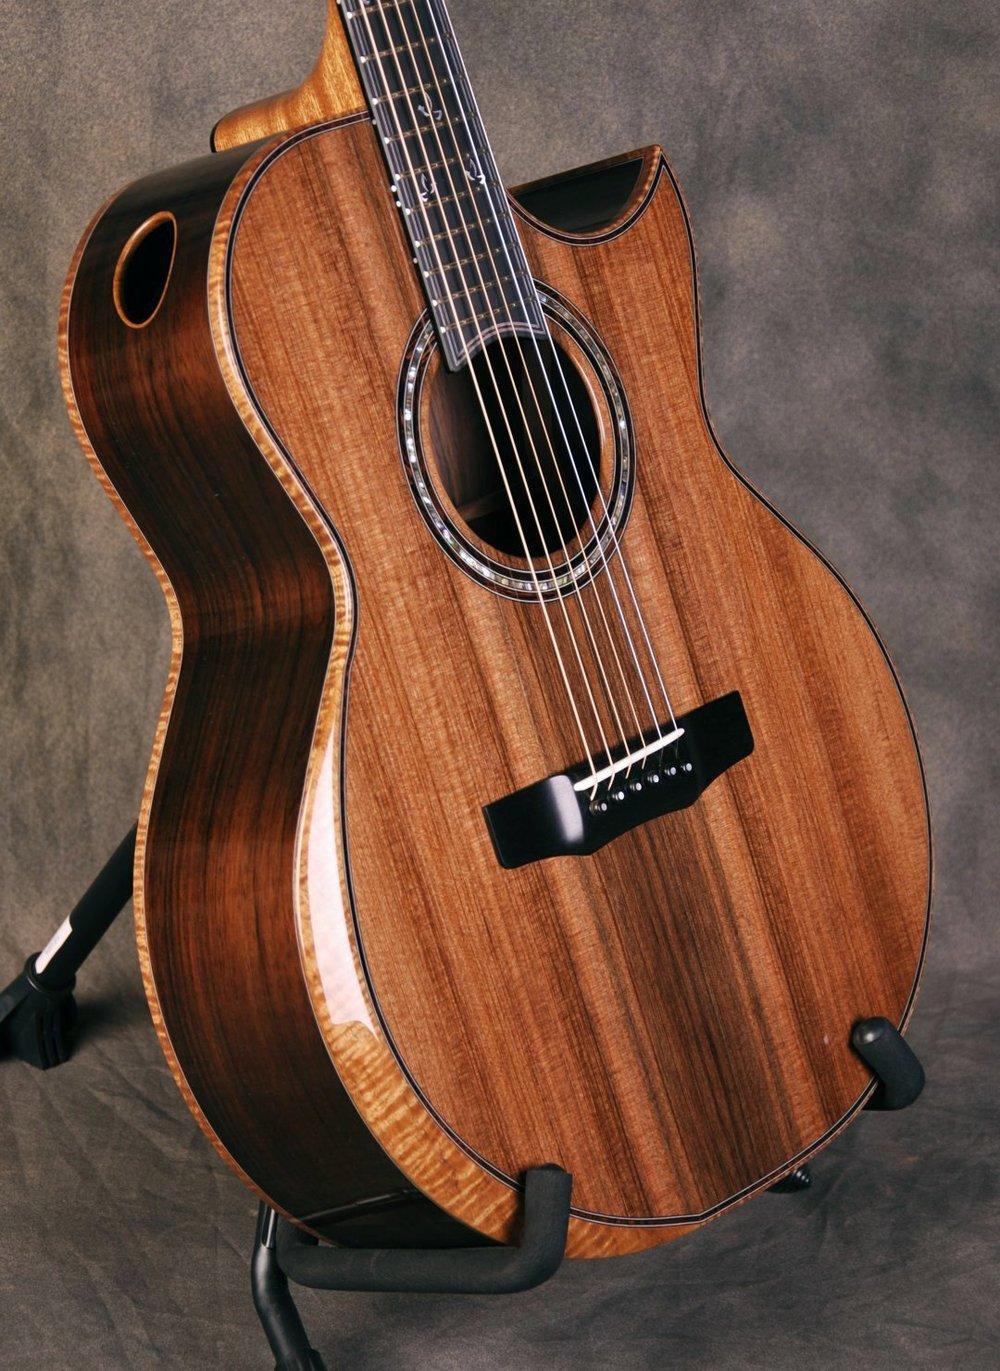 S/N 379 - Brazilian Rosewood Back/Sides, Sinker Redwood Top